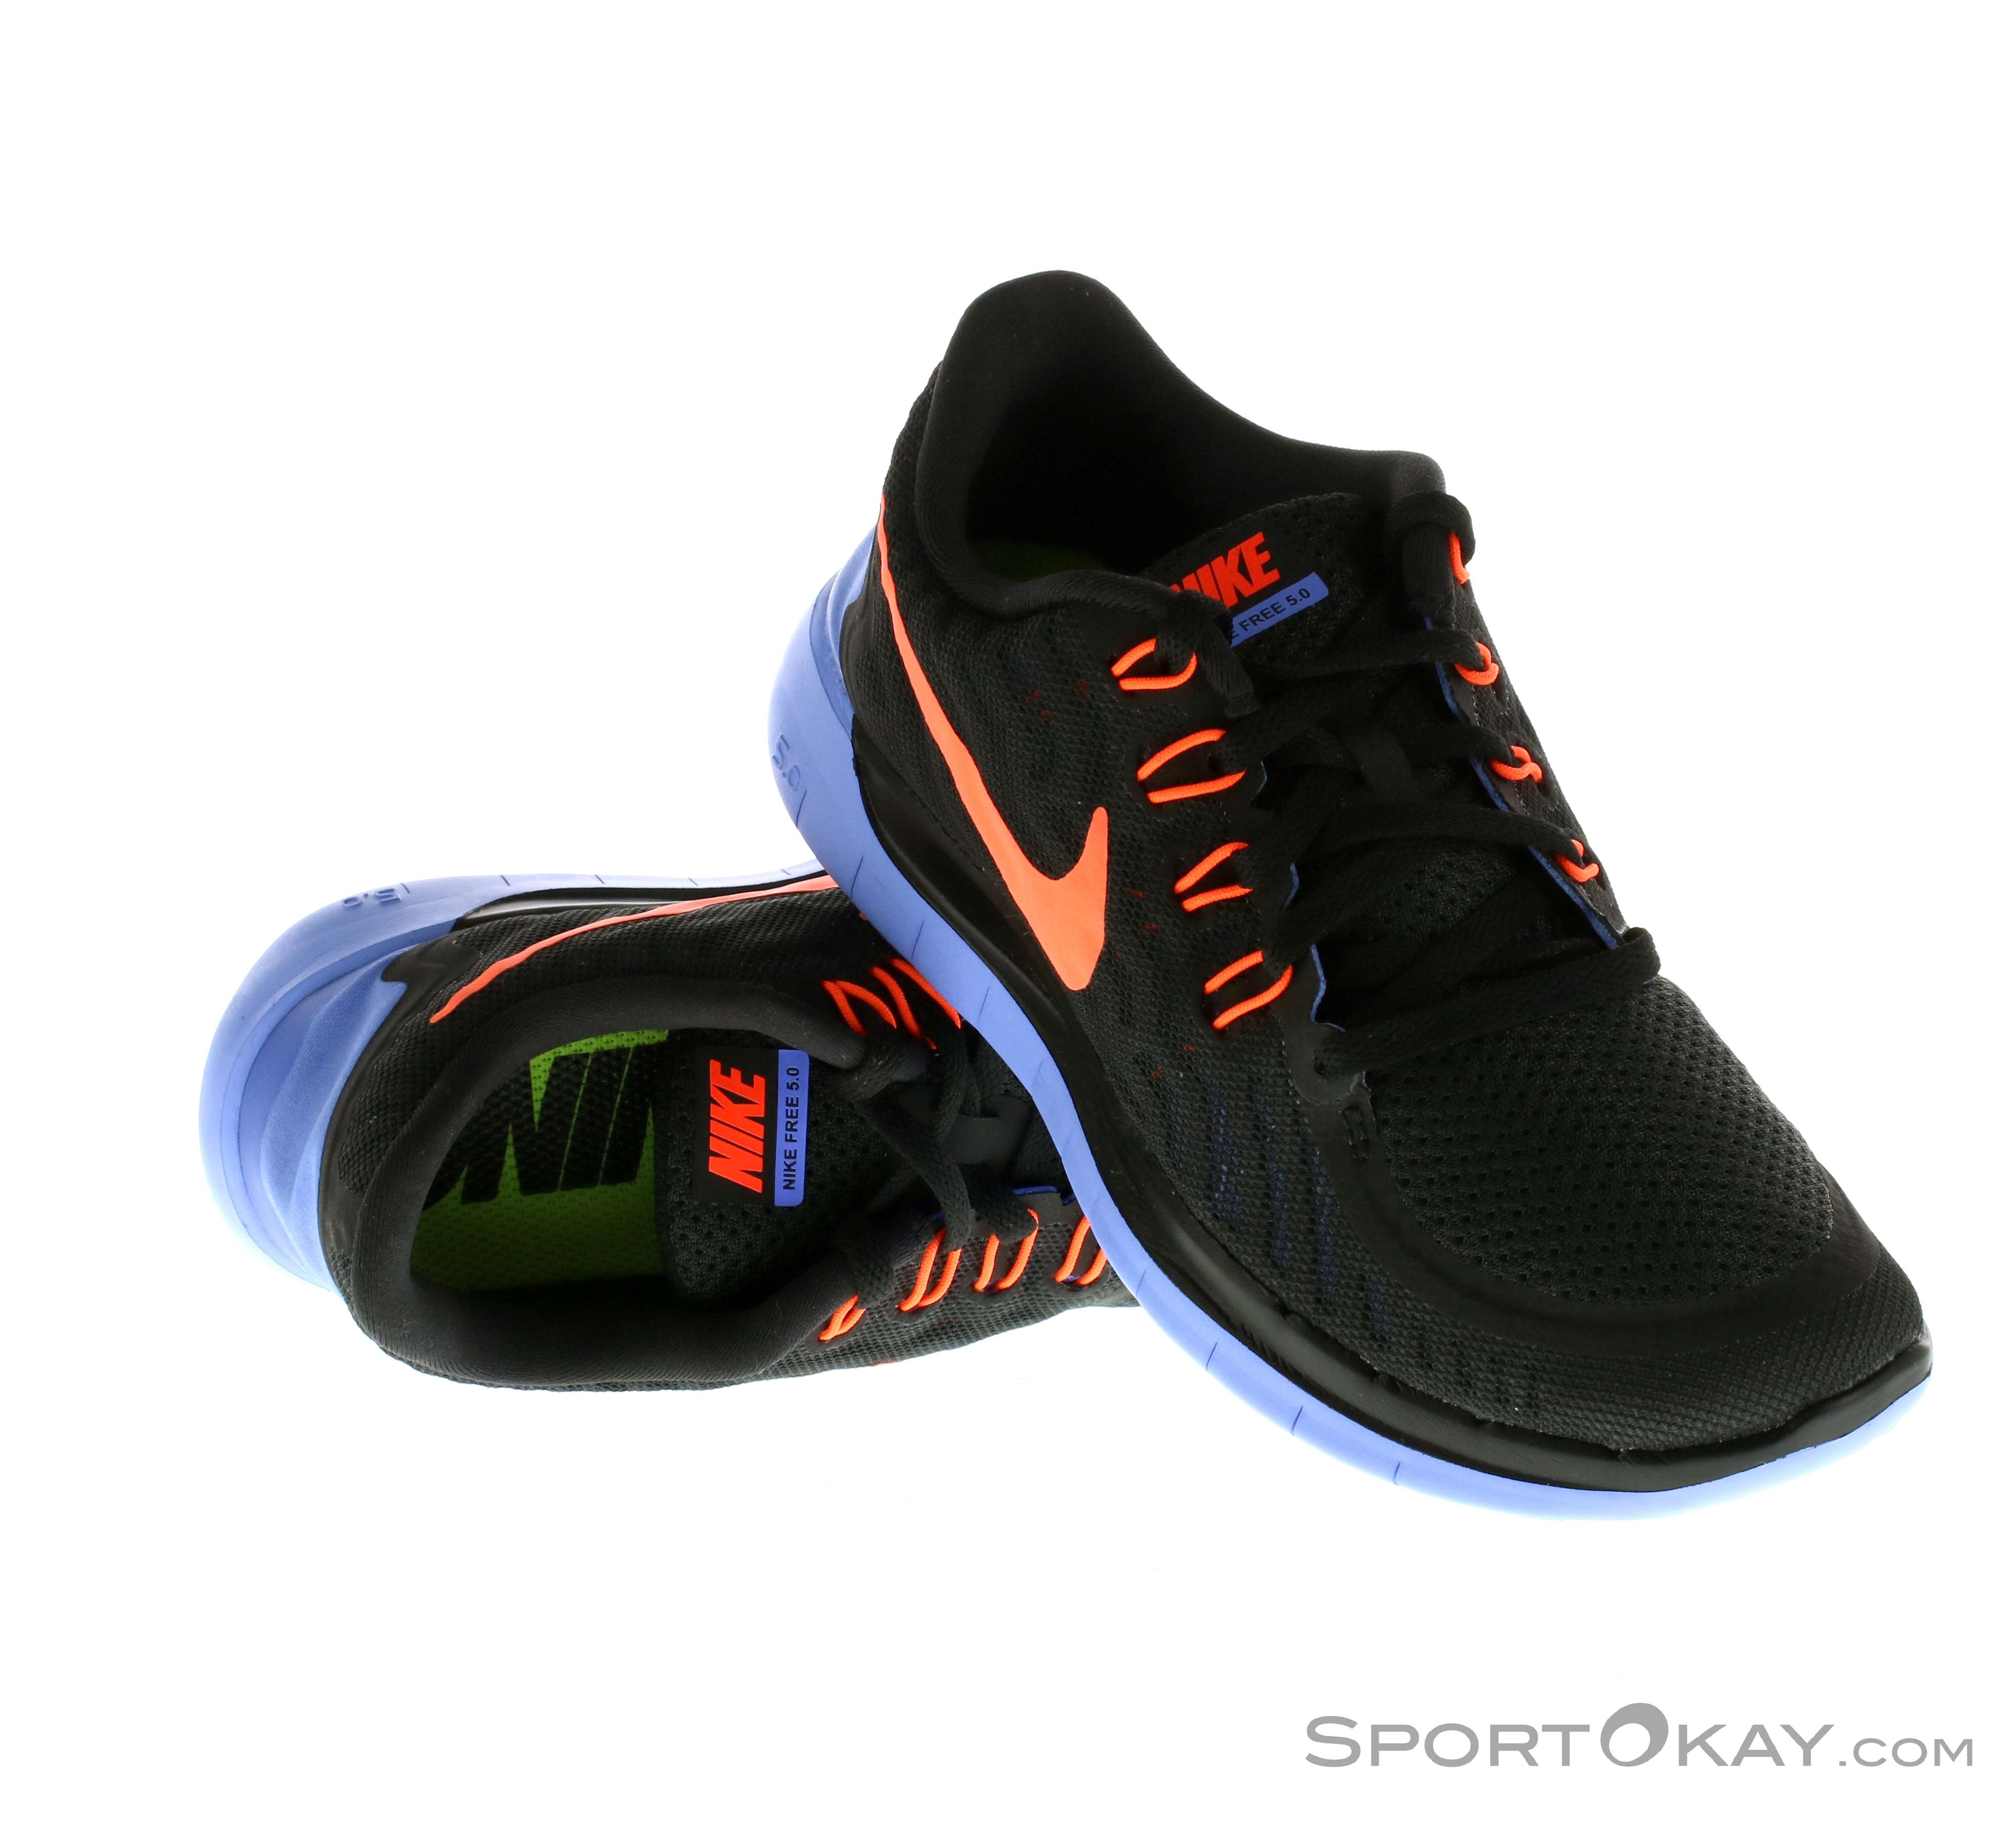 Nike Free 5.0 Damen Laufschuhe, Nike, Schwarz, , Damen, 0026-10359